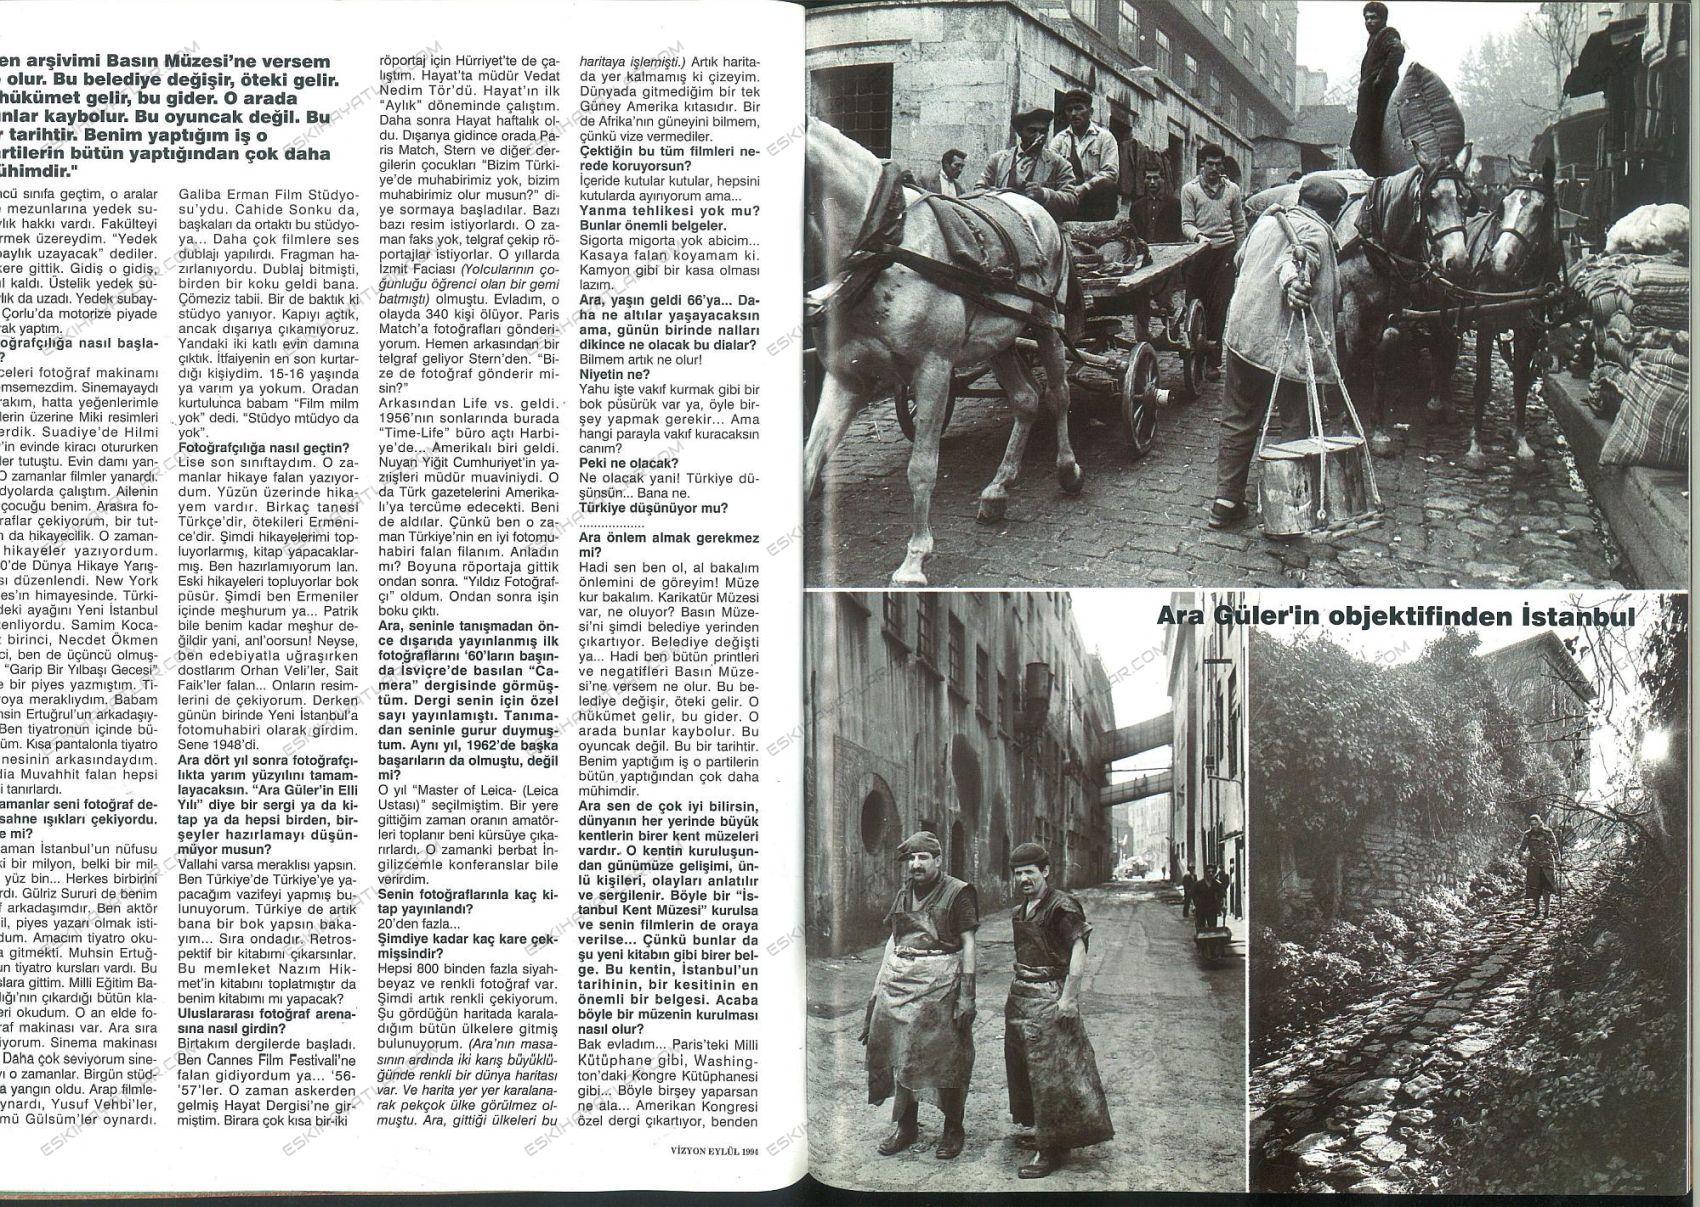 0364-ara-guler-1994-vizyon-dergisi-eski-istanbul-anilari-roportaj (2)